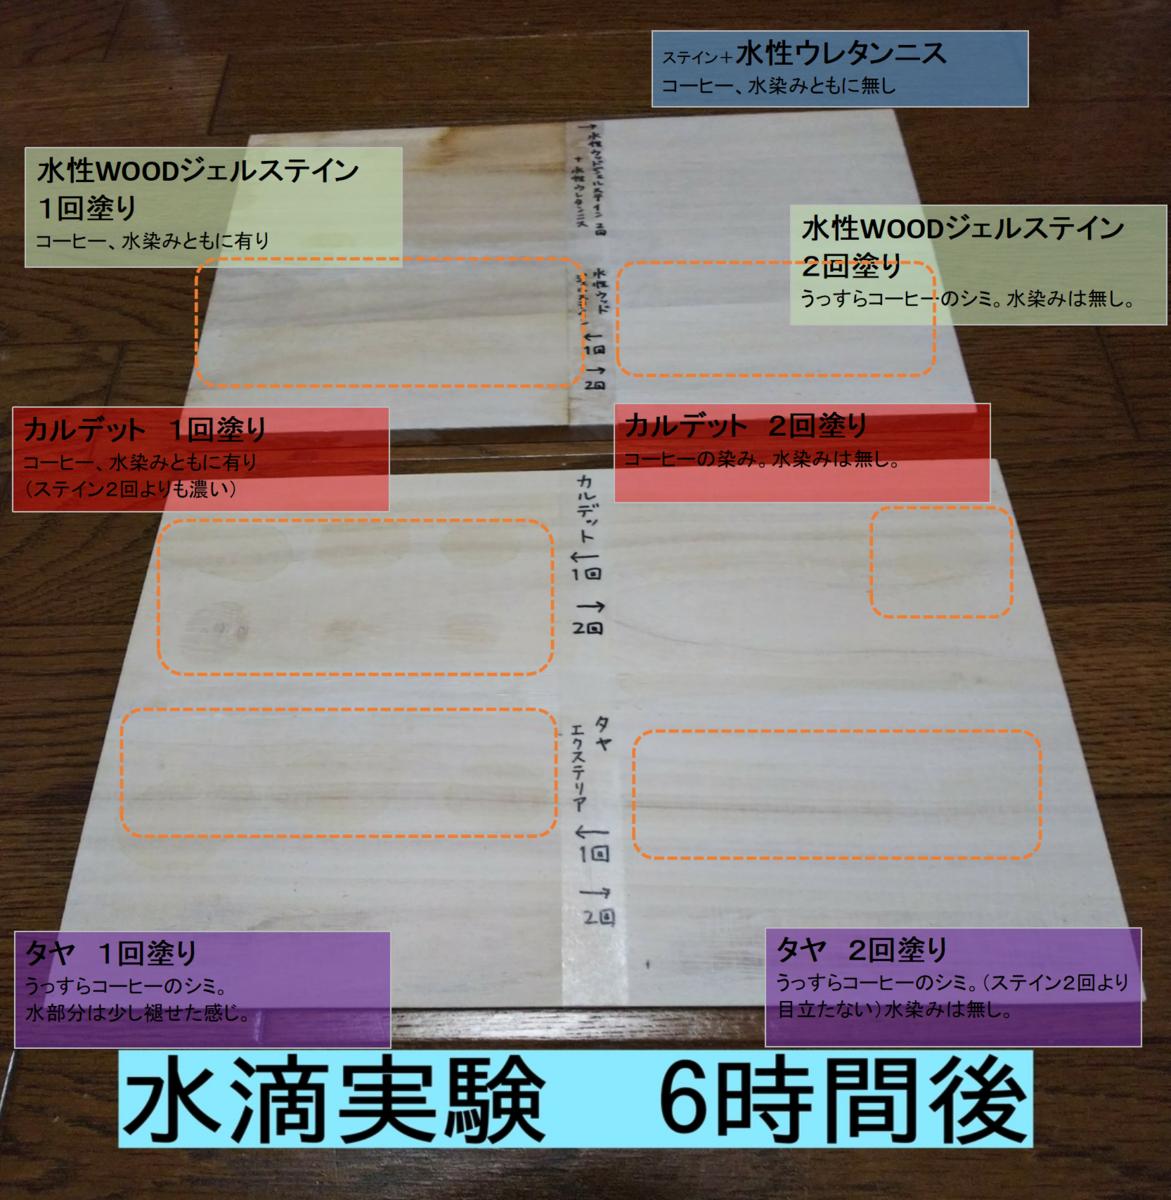 f:id:natsumikandiy:20210525205114p:plain